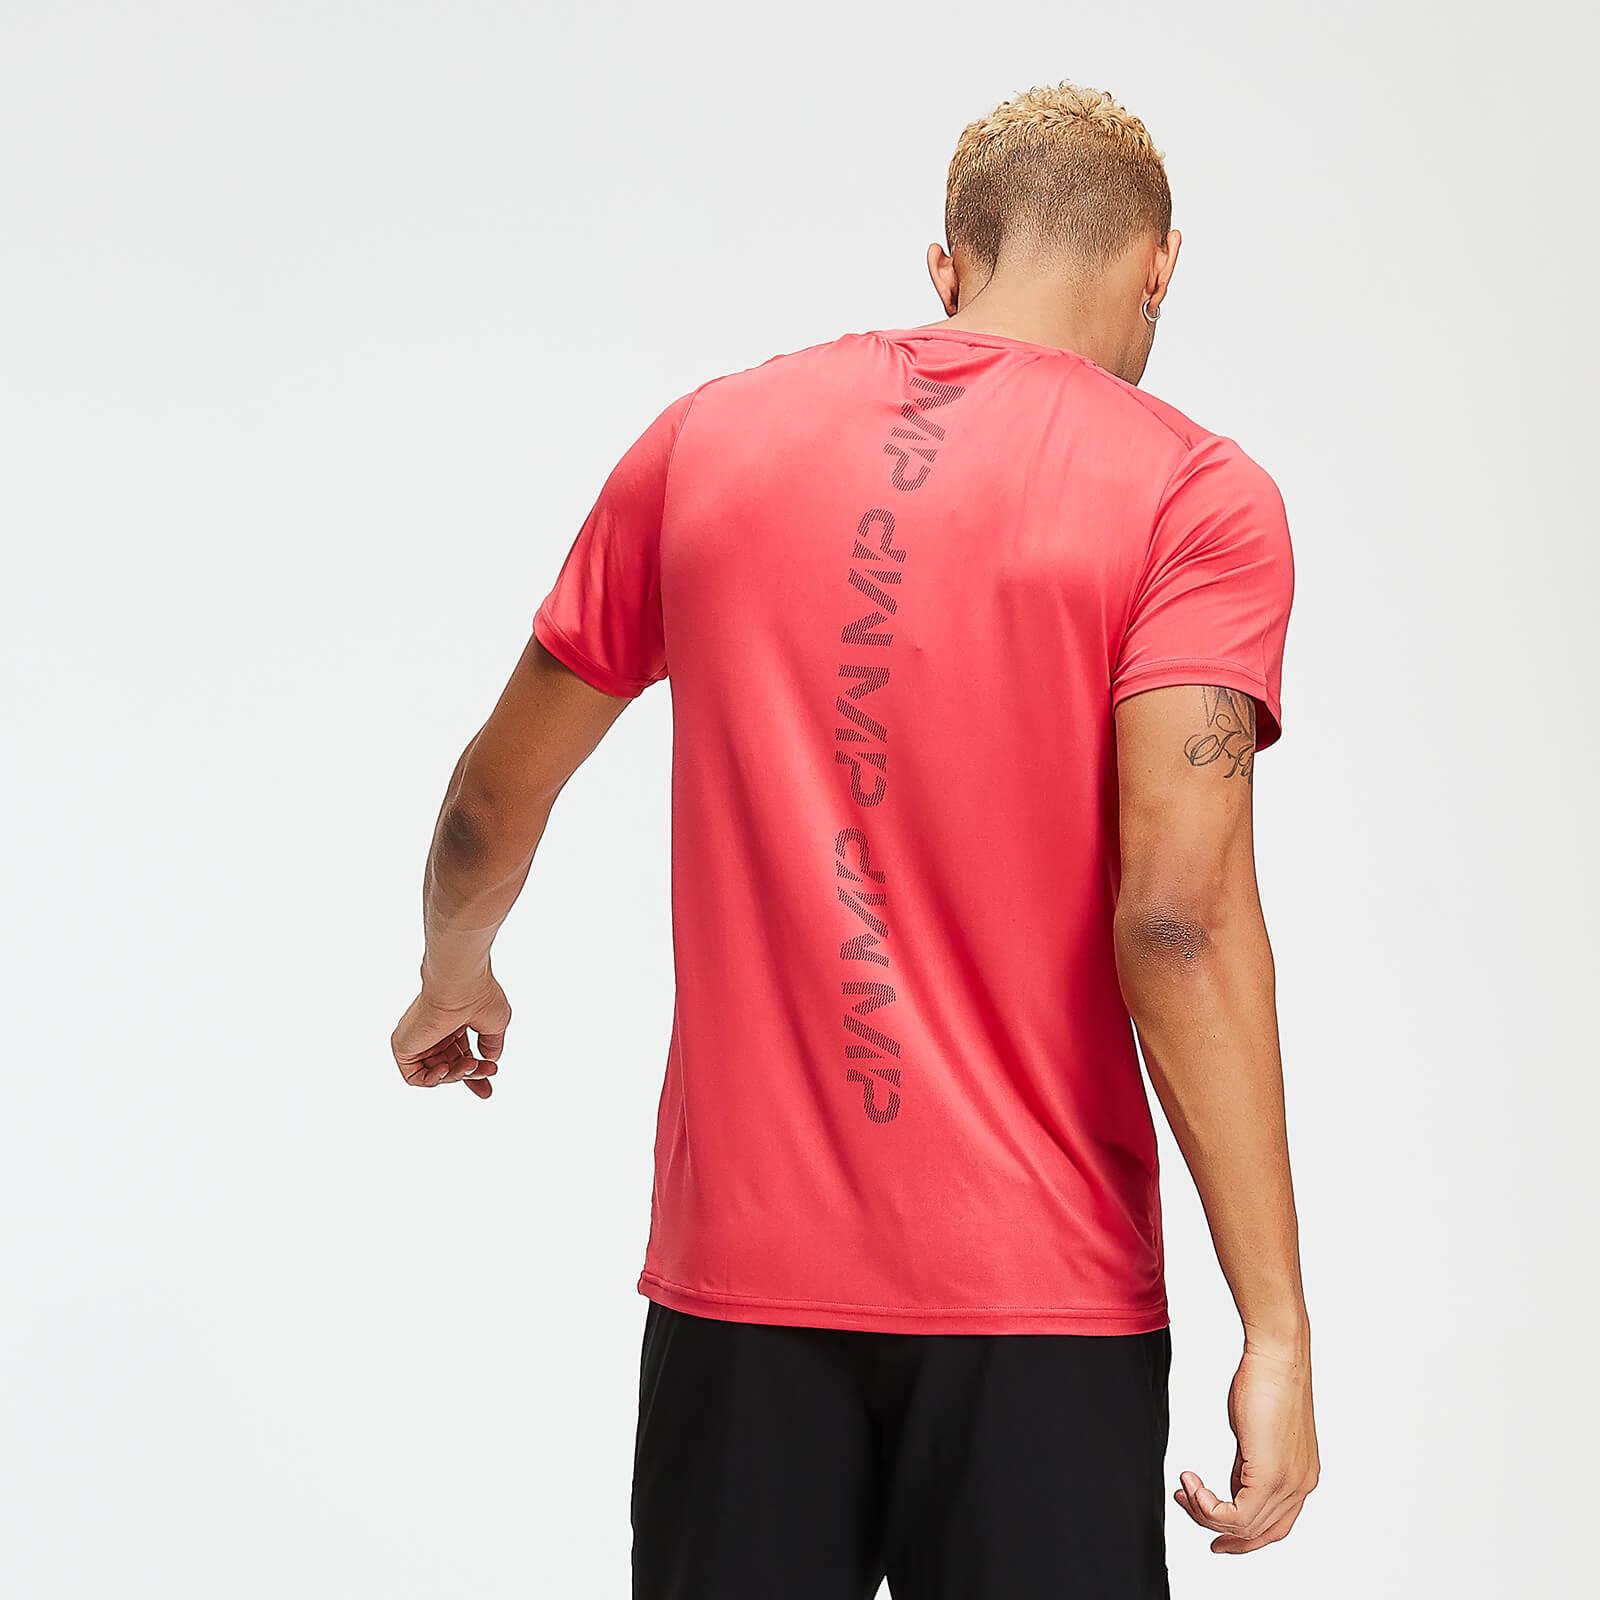 Myprotein Training T-Shirt - Washed Red - XXL